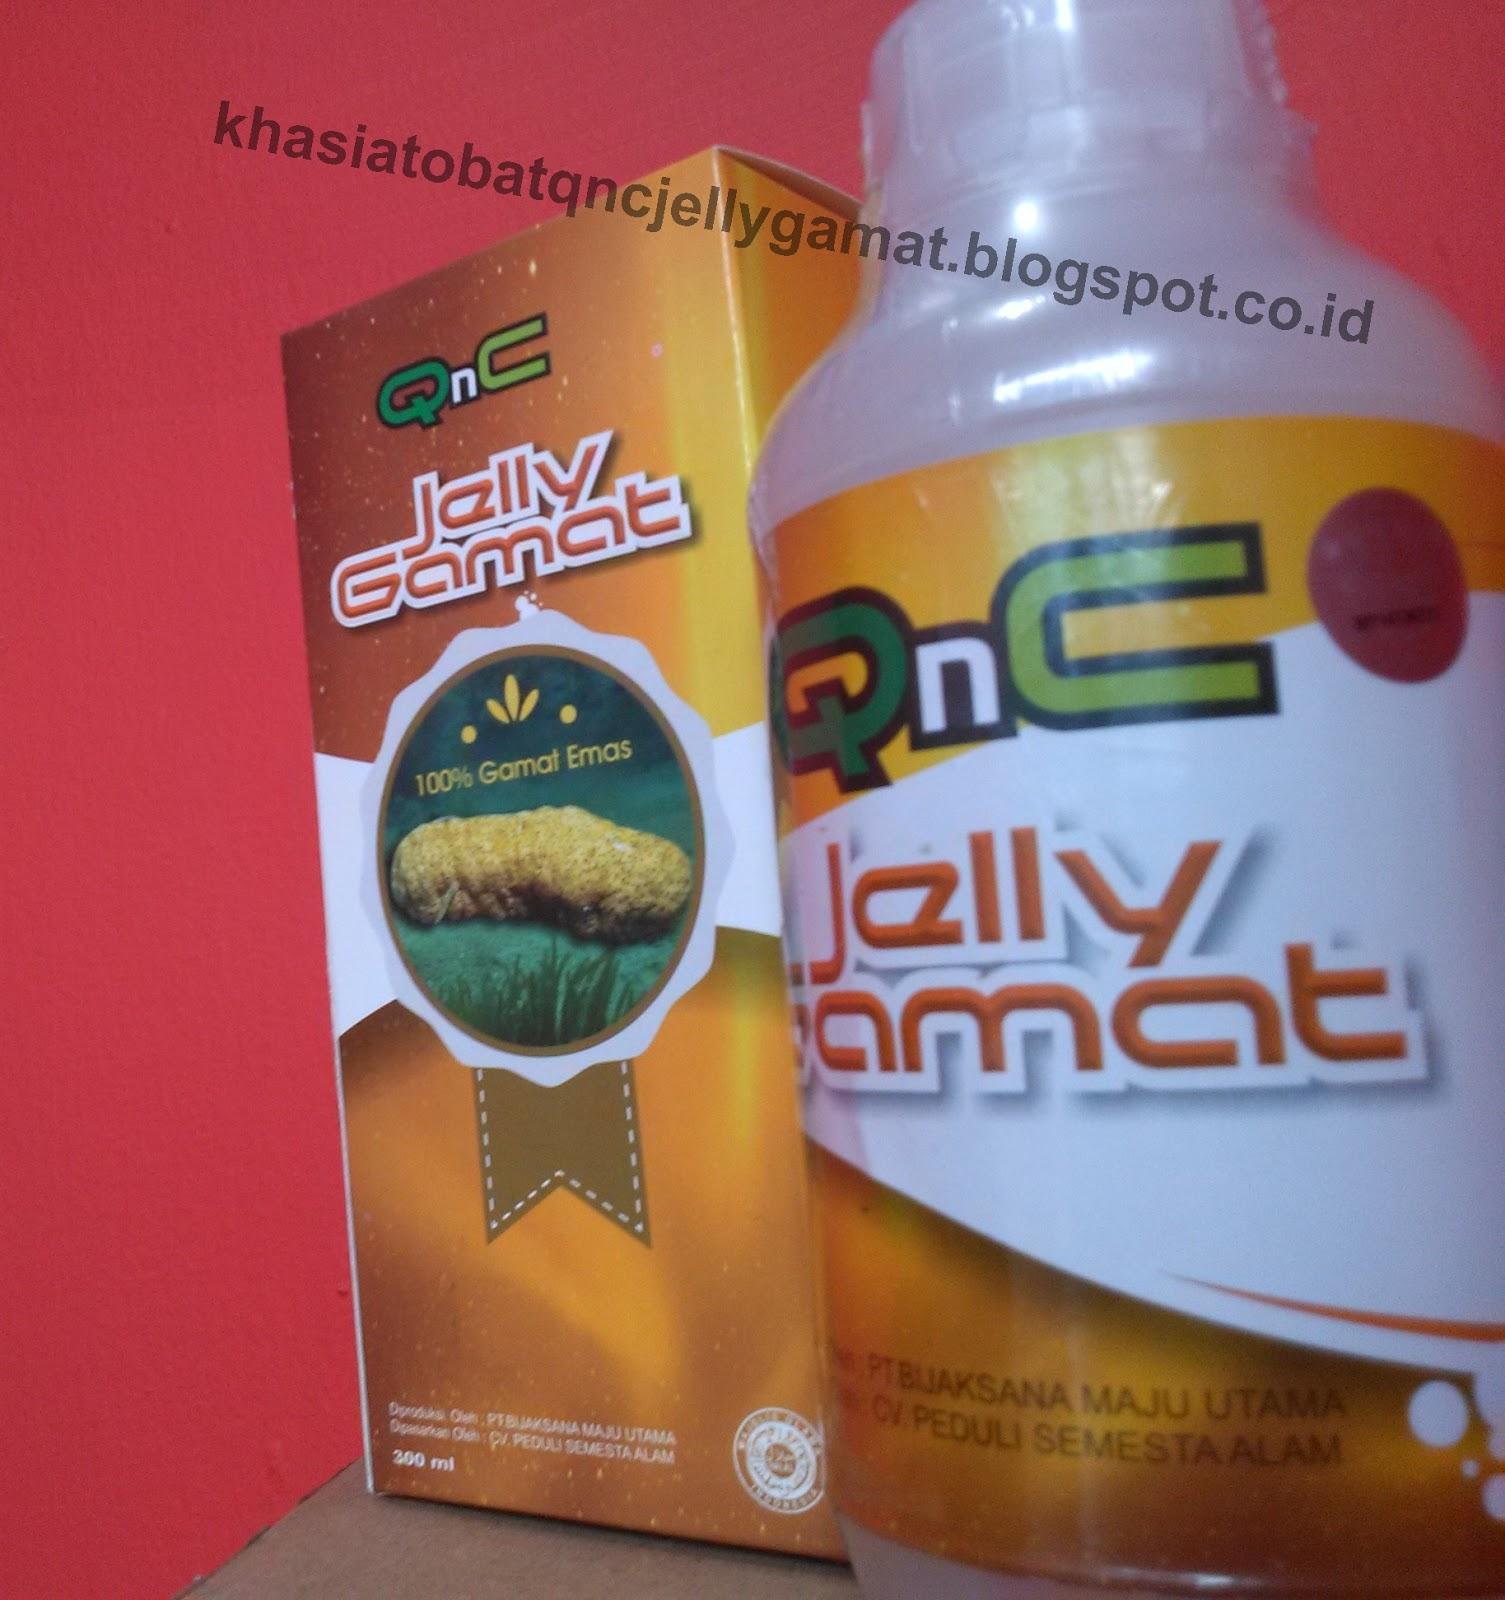 Khasiat Obat QnC Jelly Gamat 100% Asli Herbal